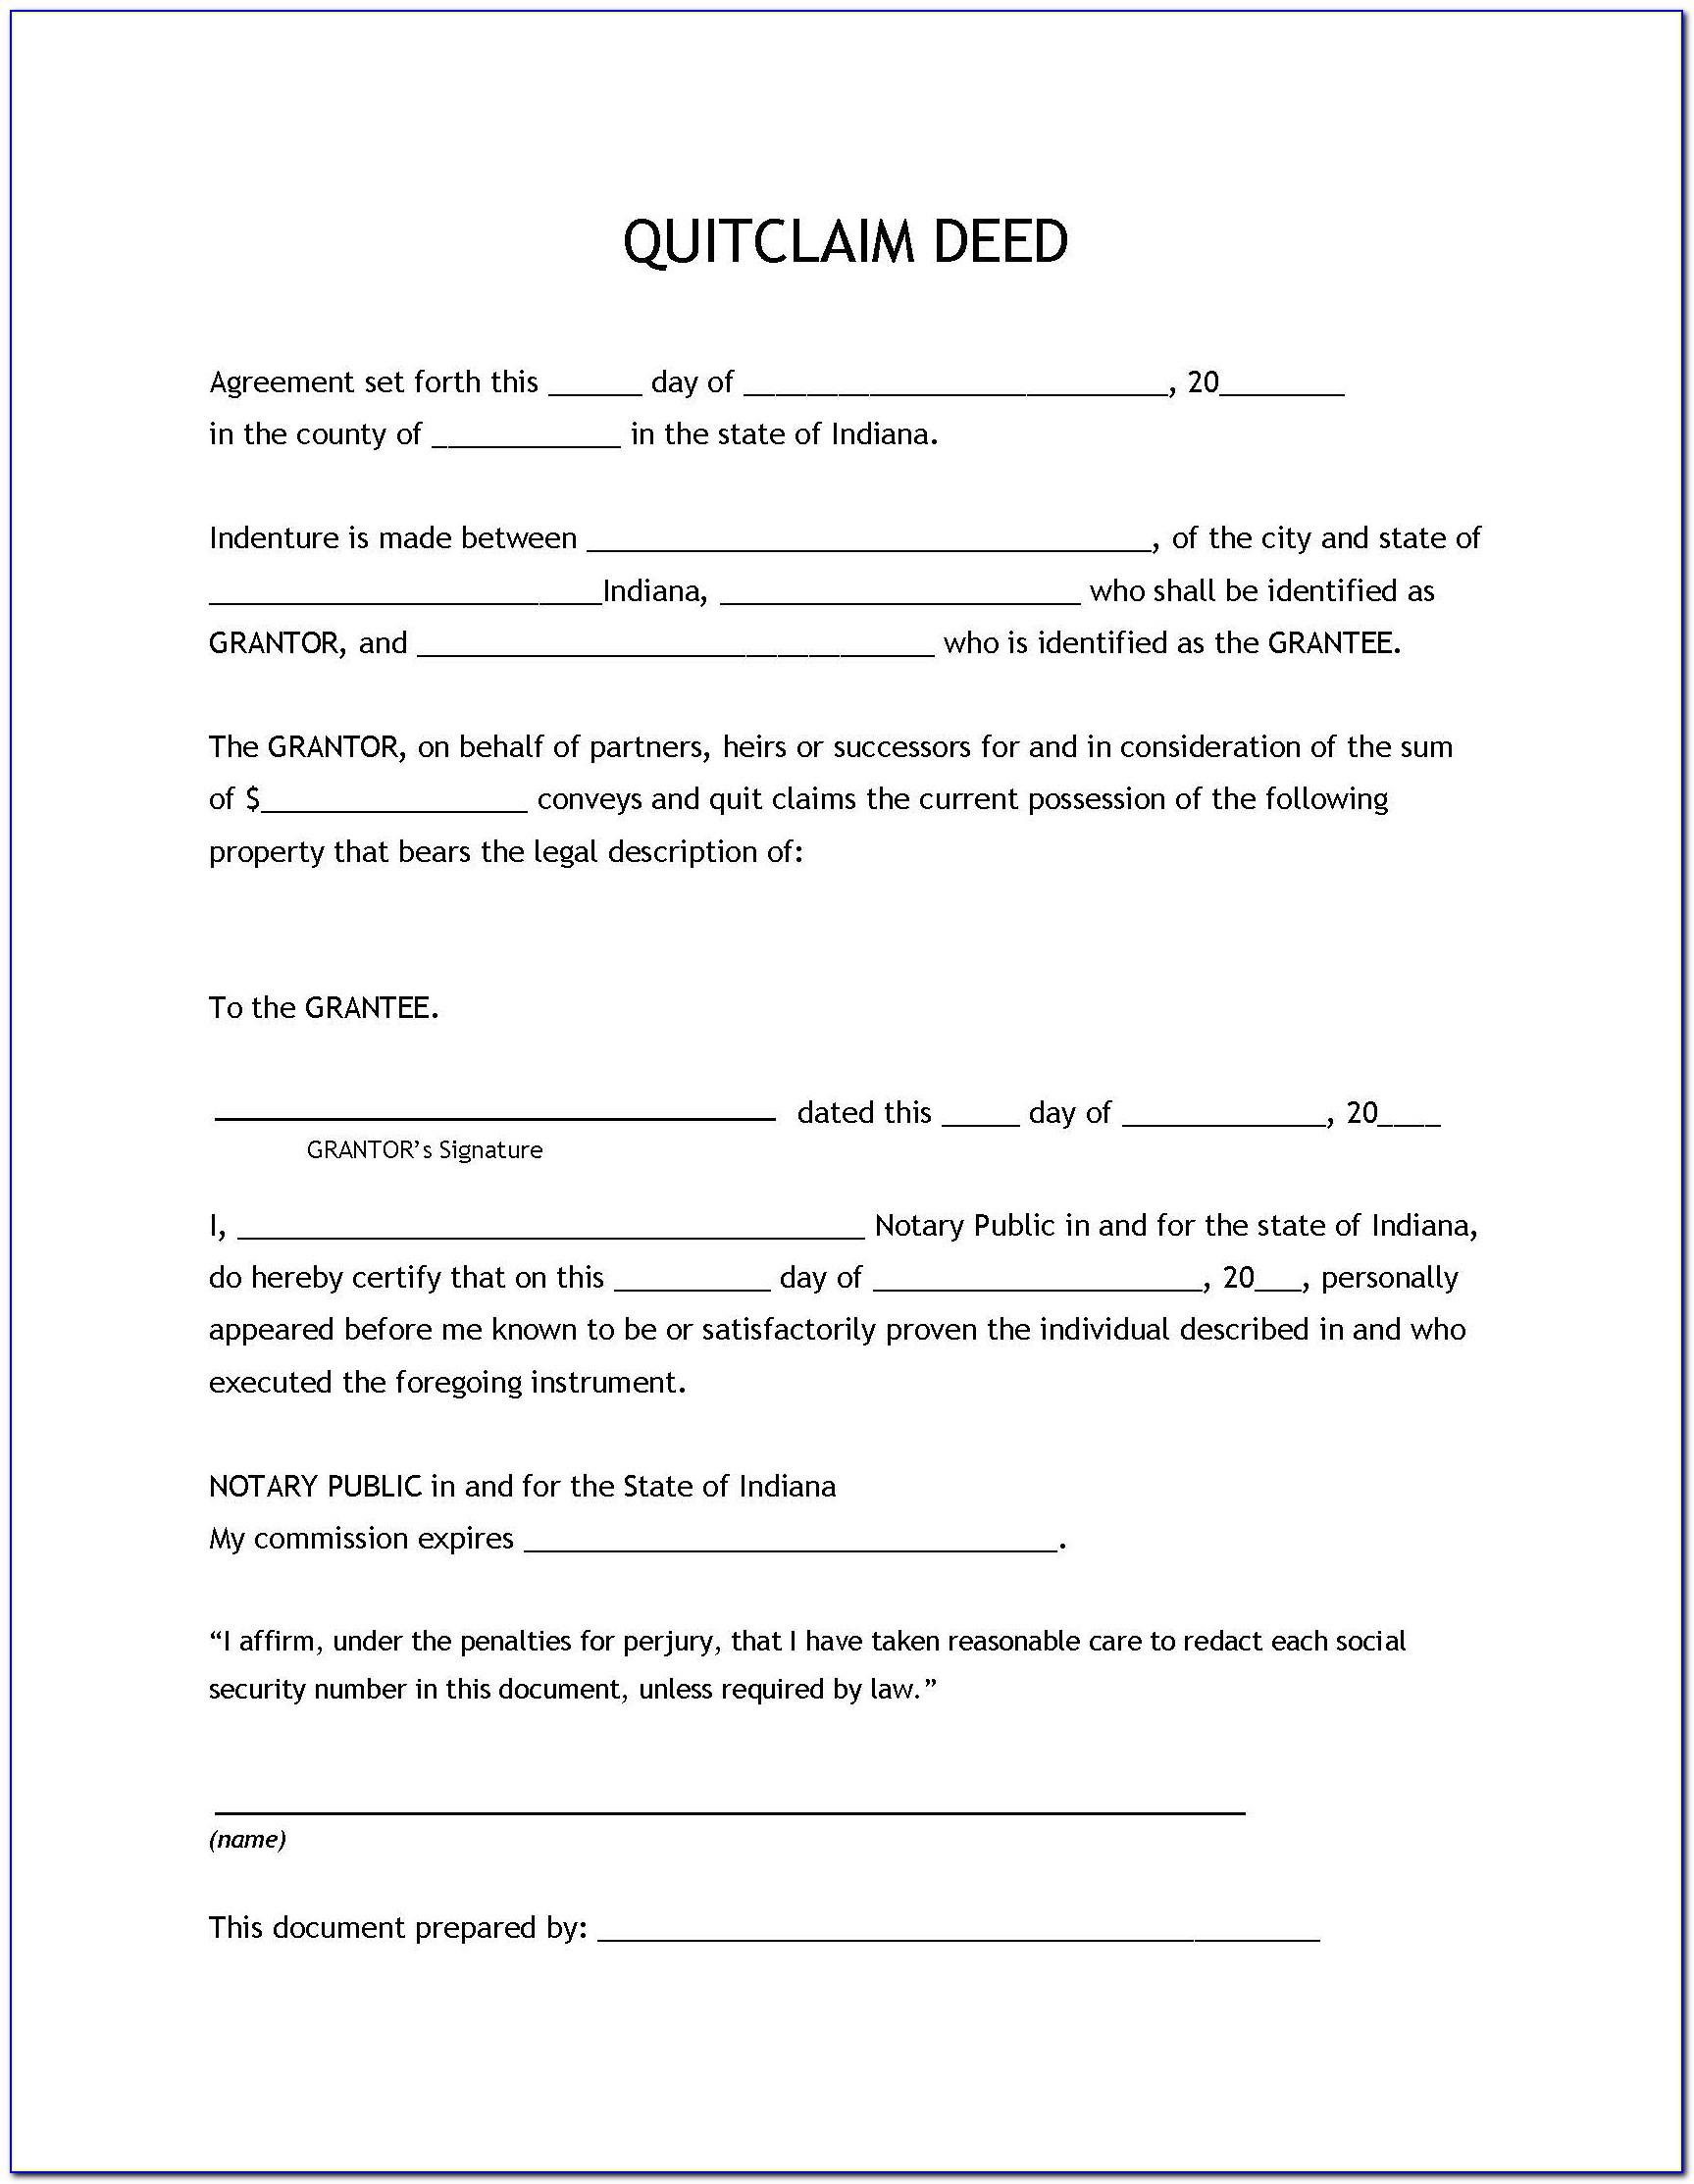 Quit Deed Document